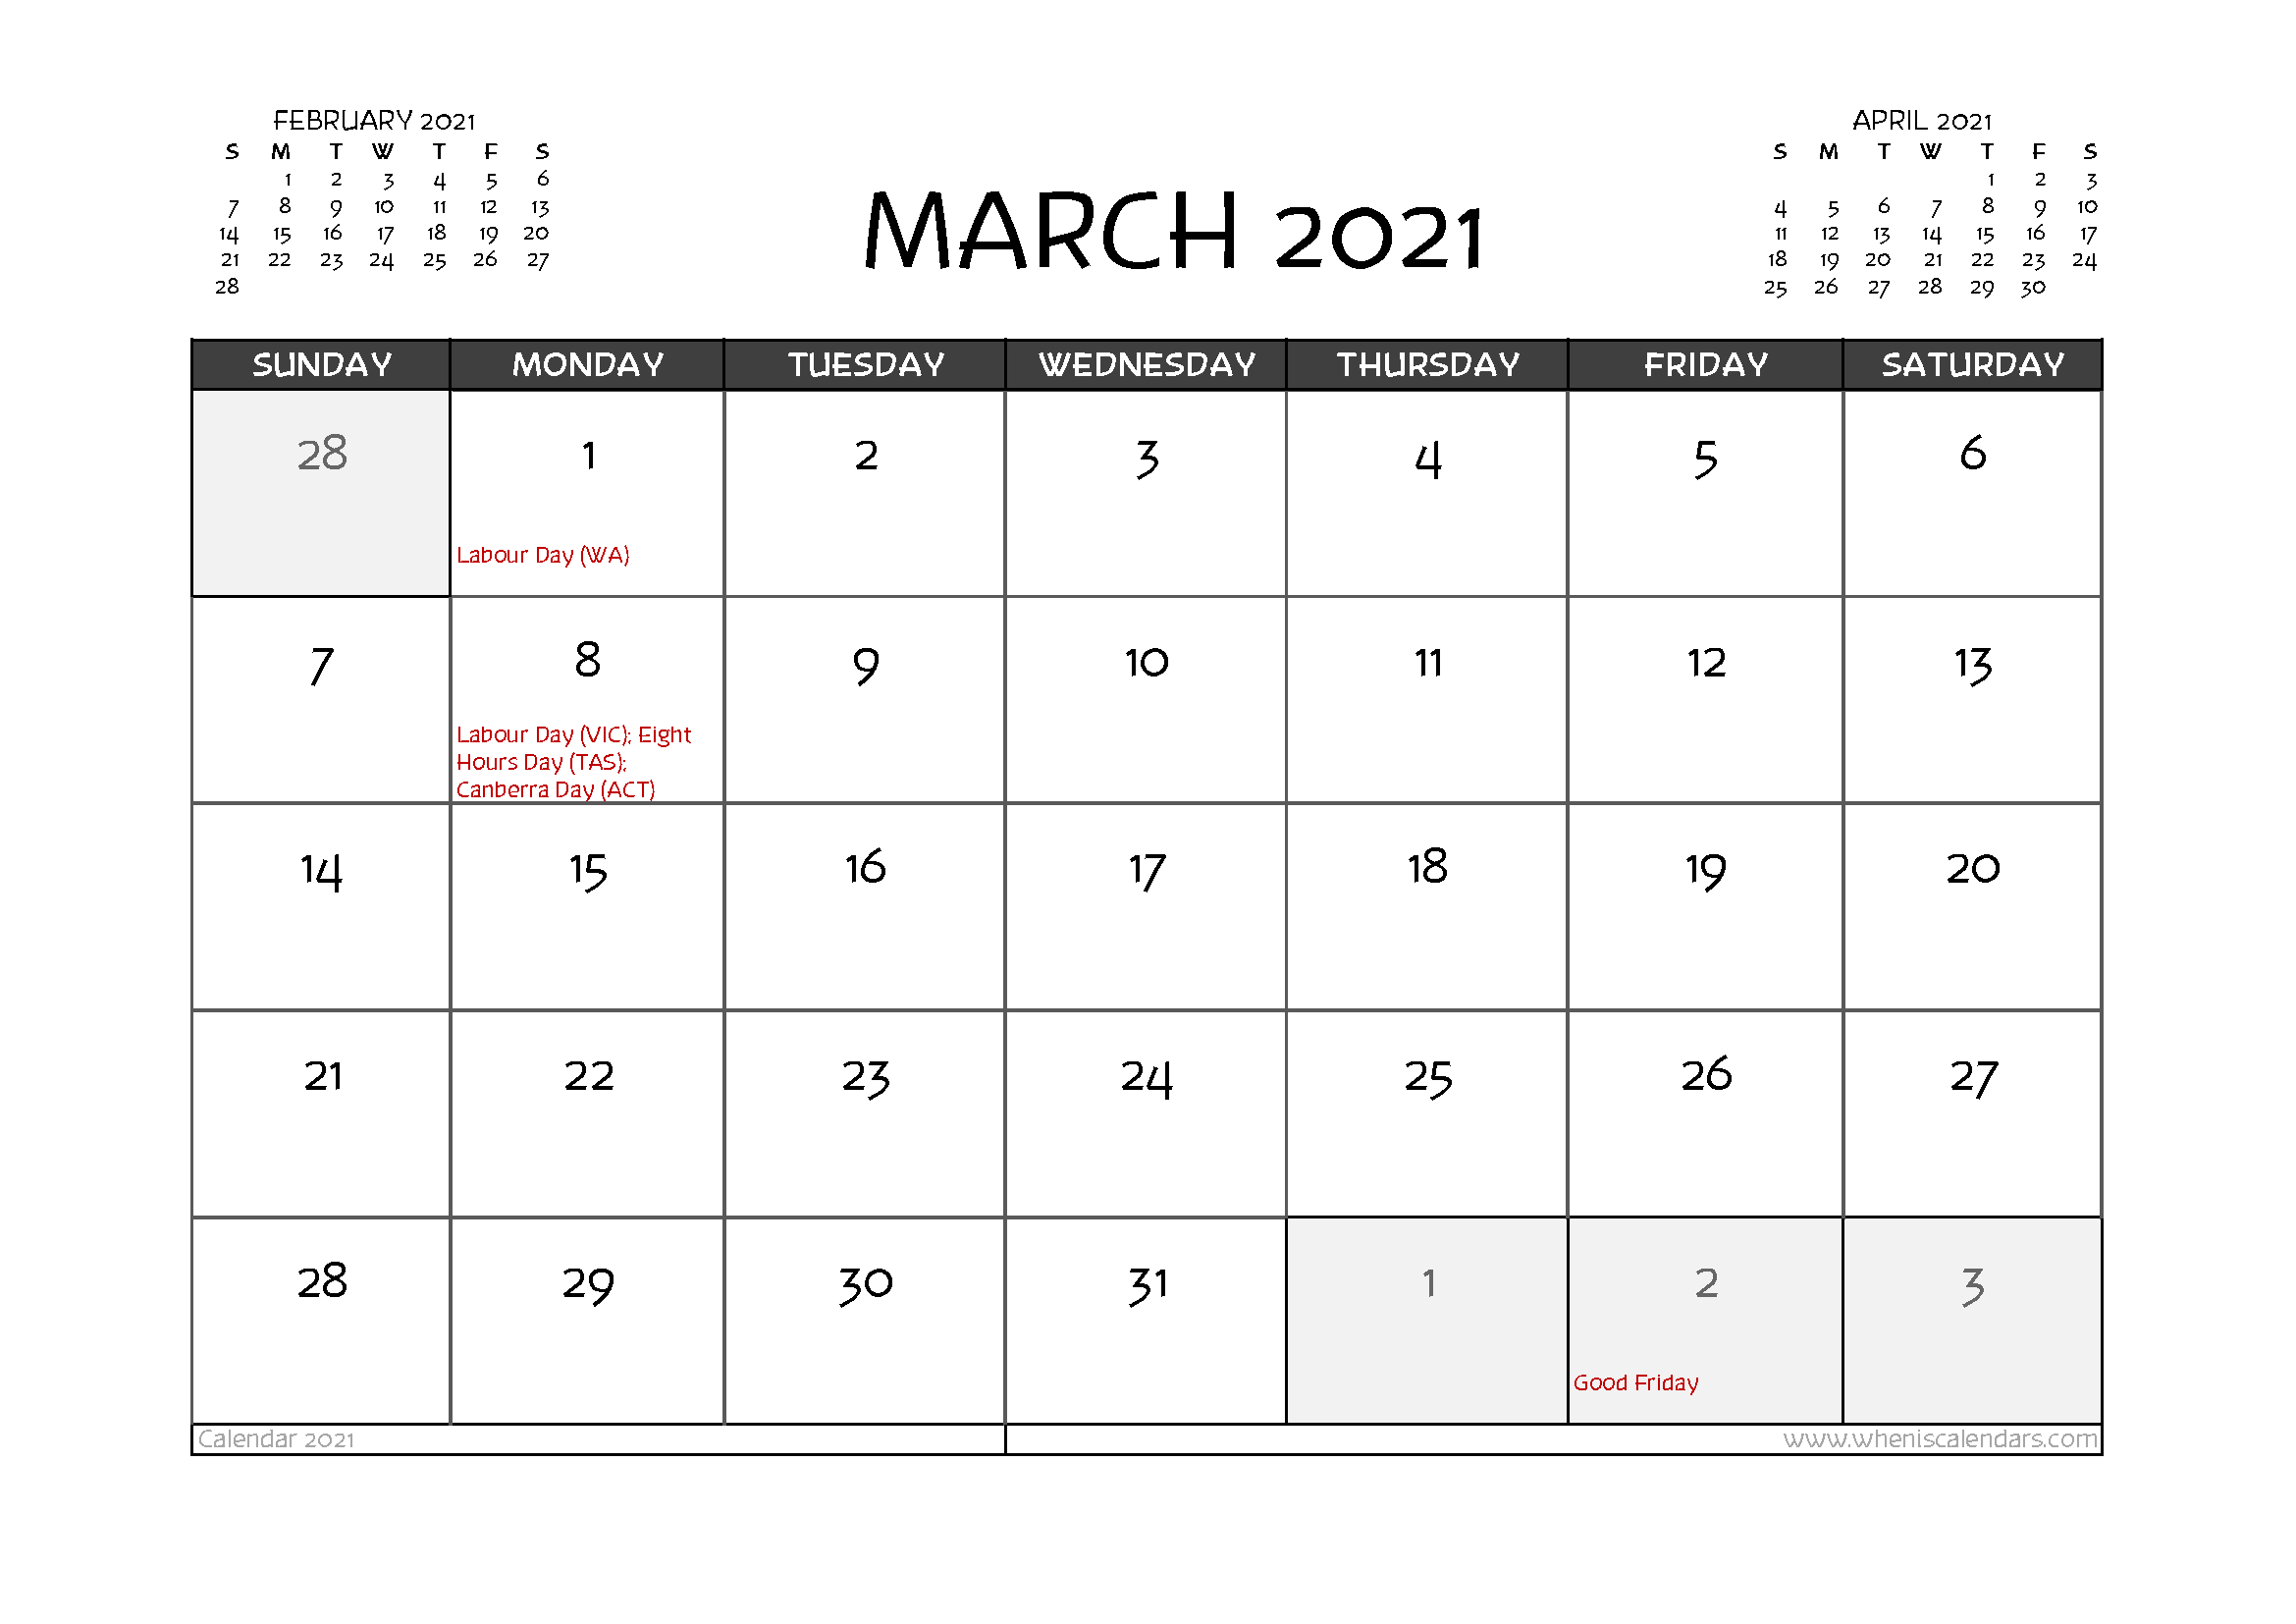 Free Printable March 2021 Calendar Australia-2021 Calendar Printable Free Pdf March